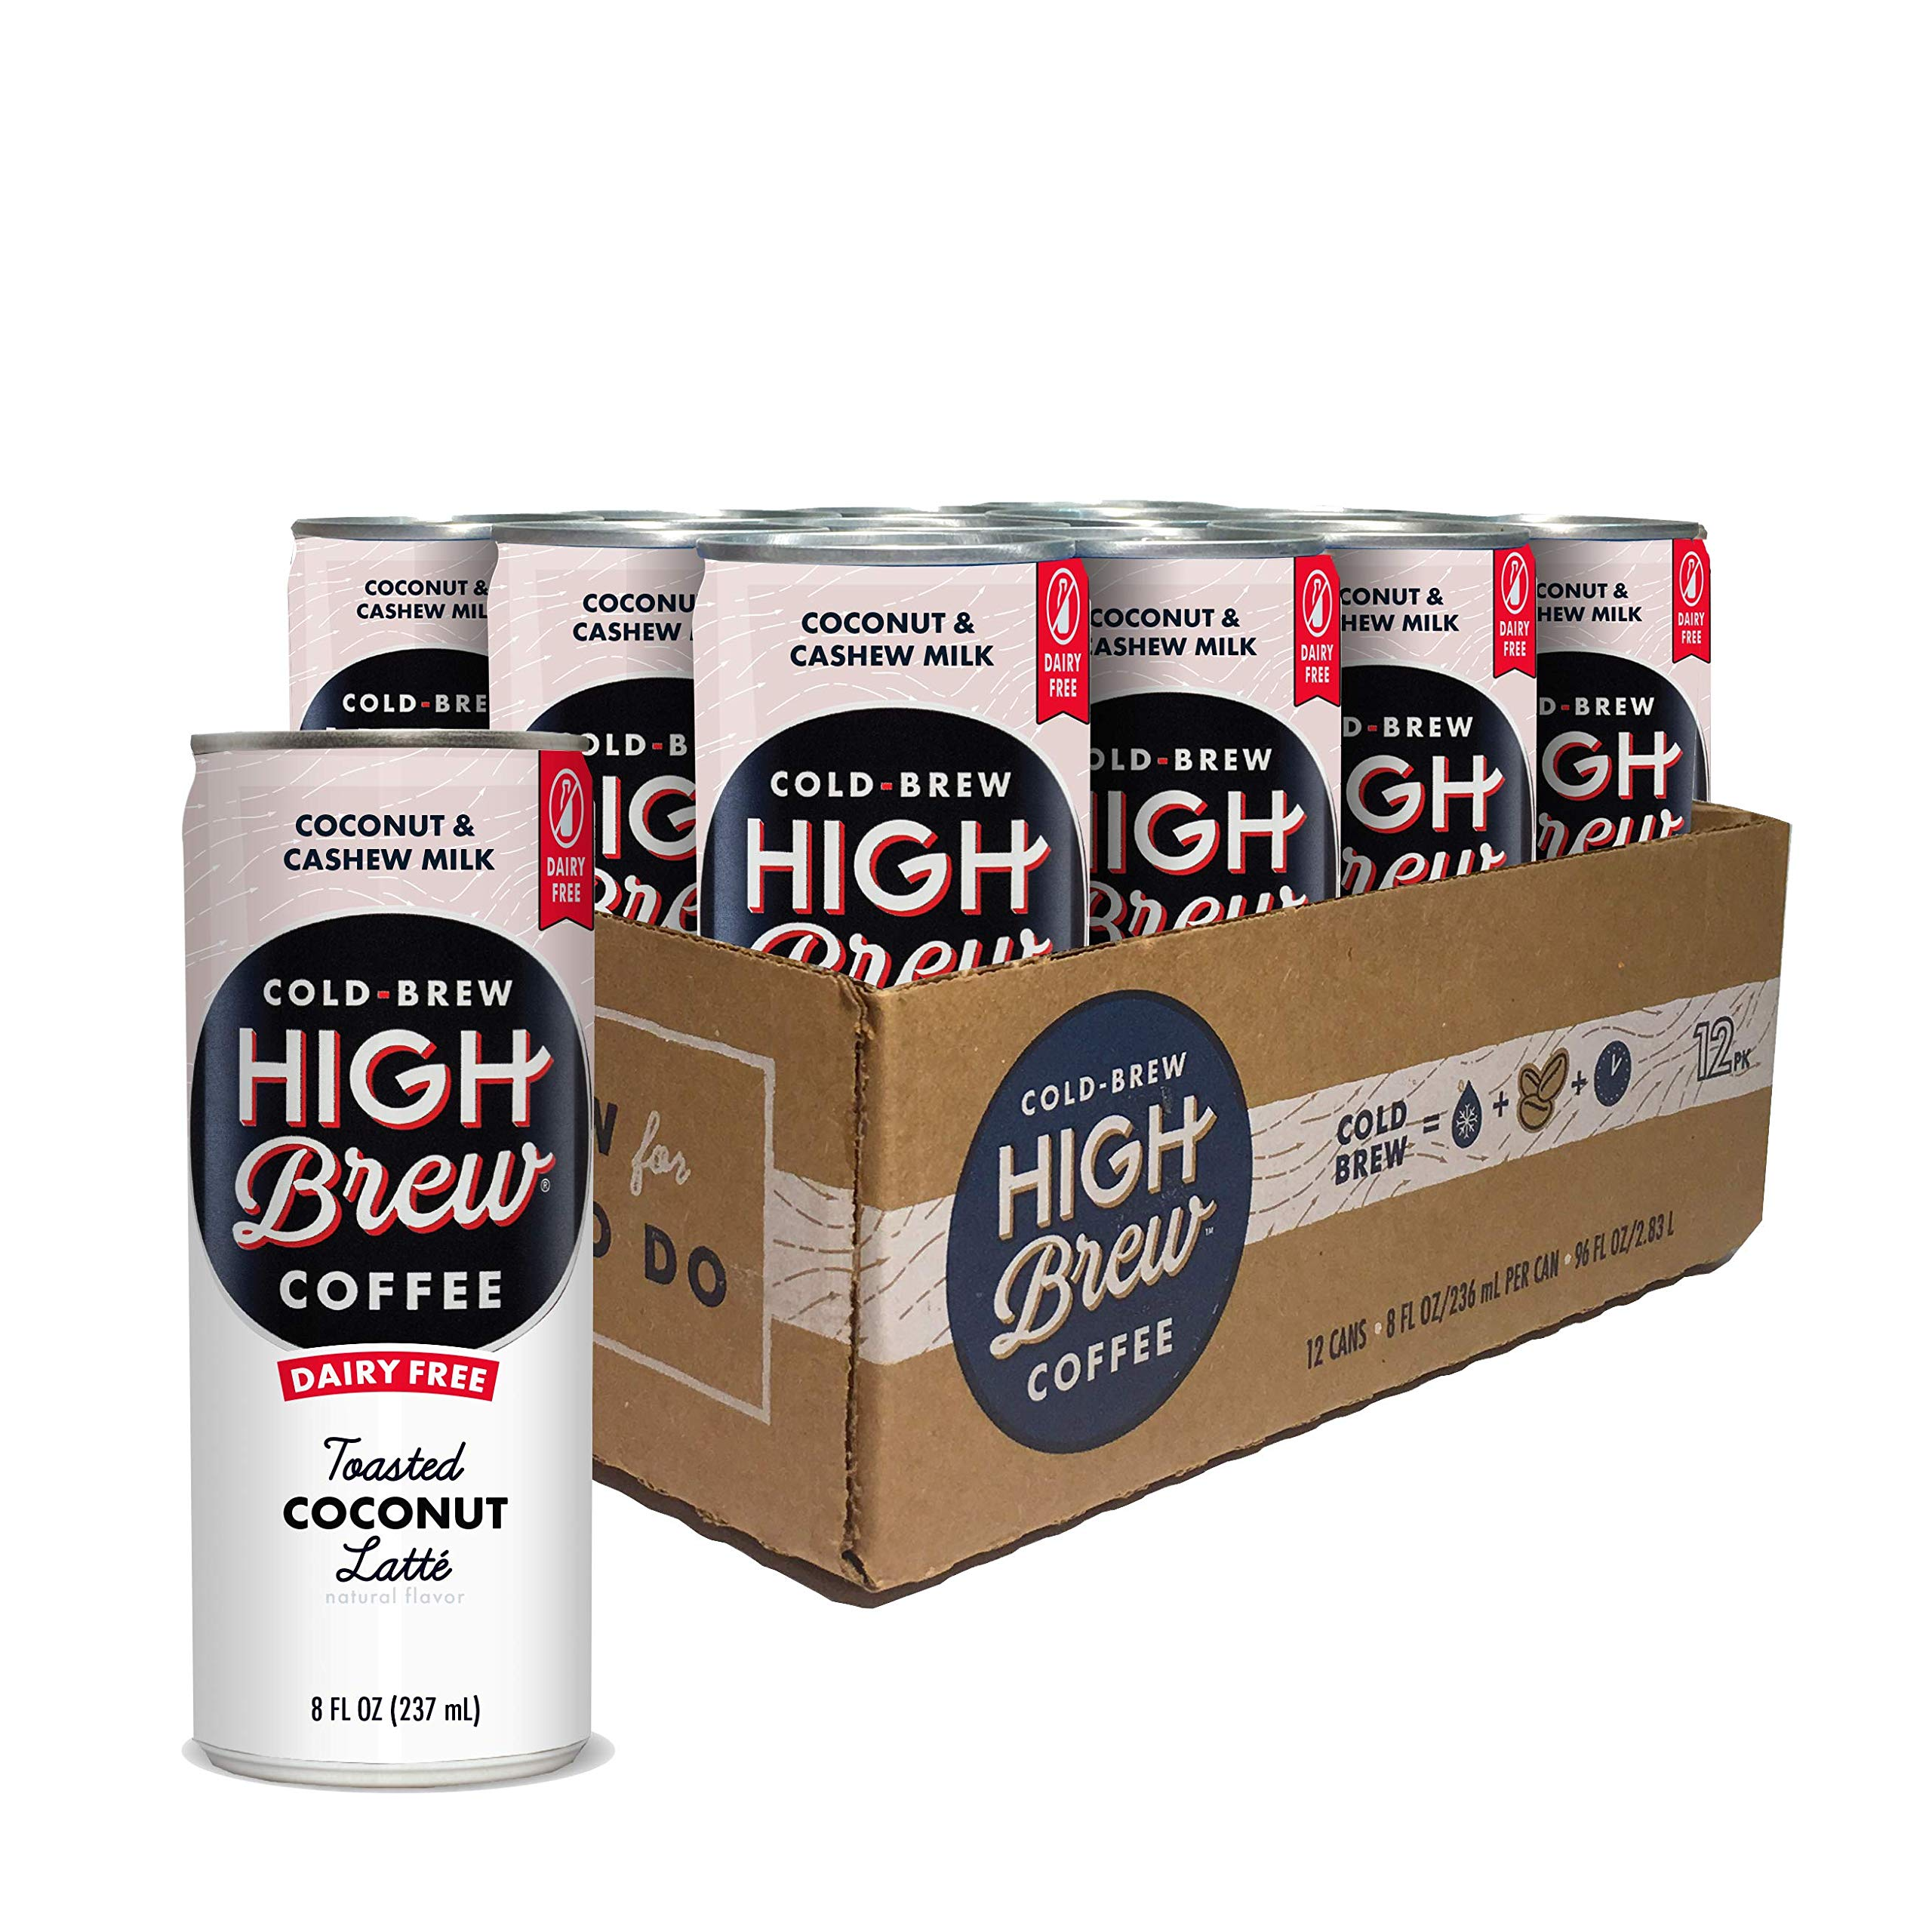 High Brew Coffee High Brew Cold Brew Coffee Toasted Coconut Latte, 8 Oz Can, 12Count